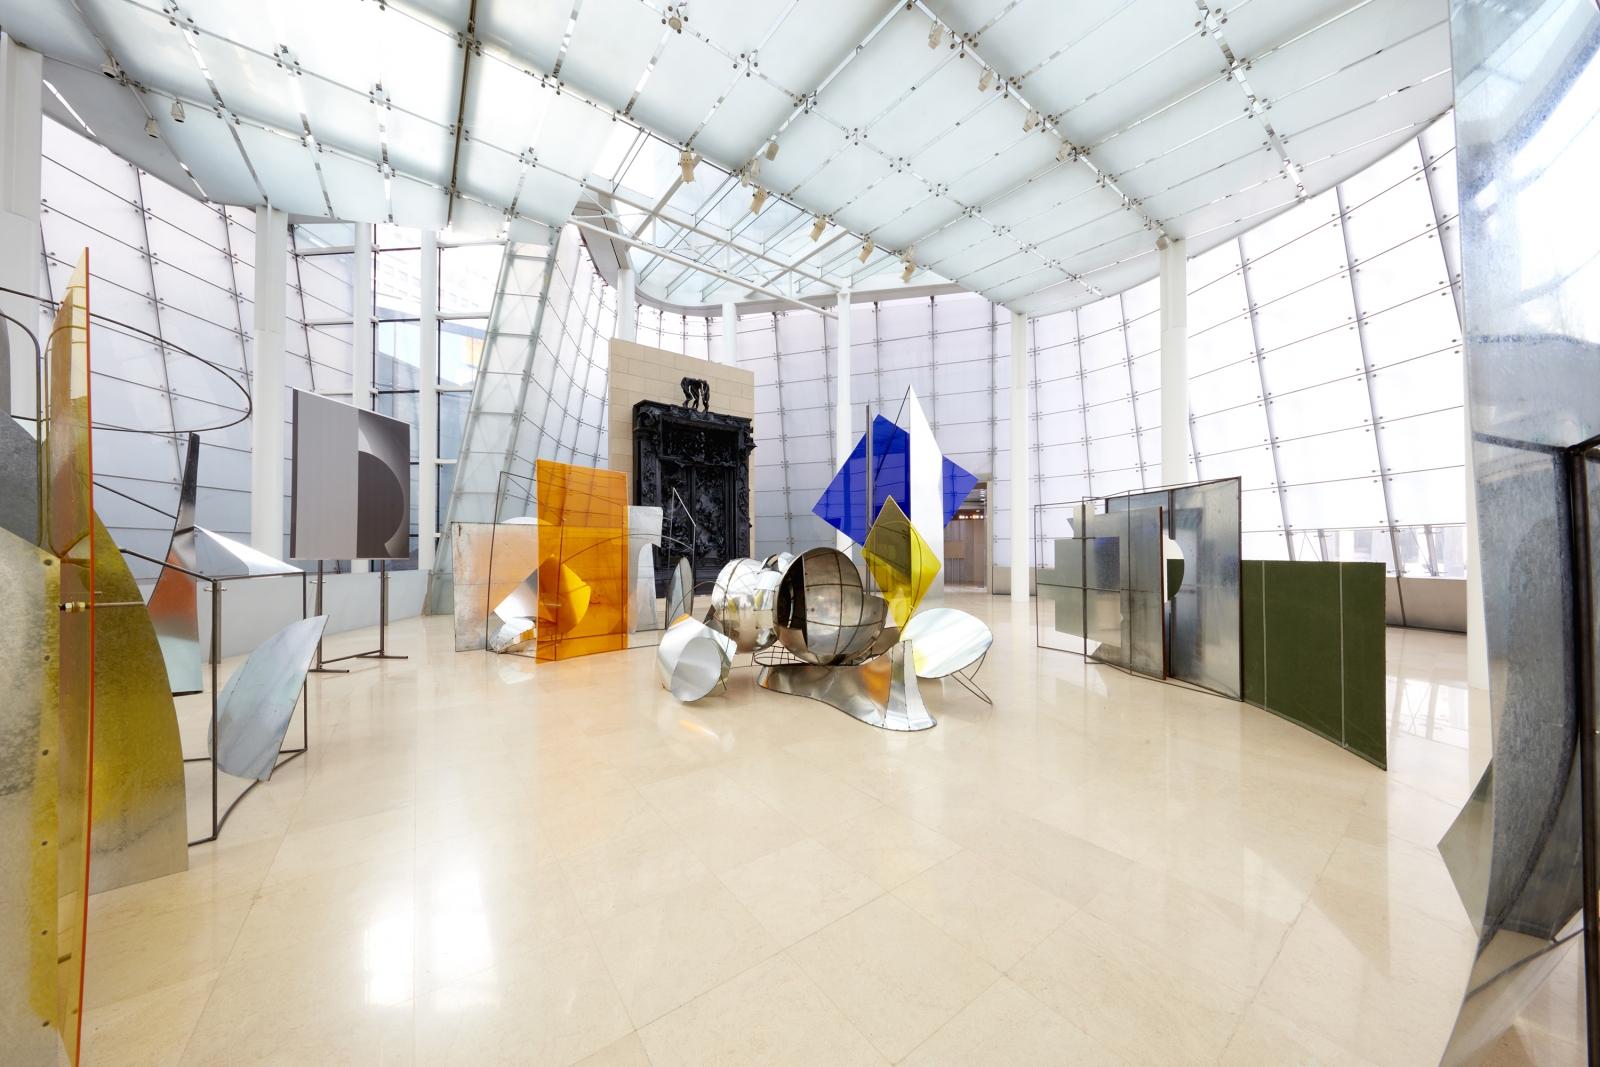 Liu Wei, Panorama, Installation view